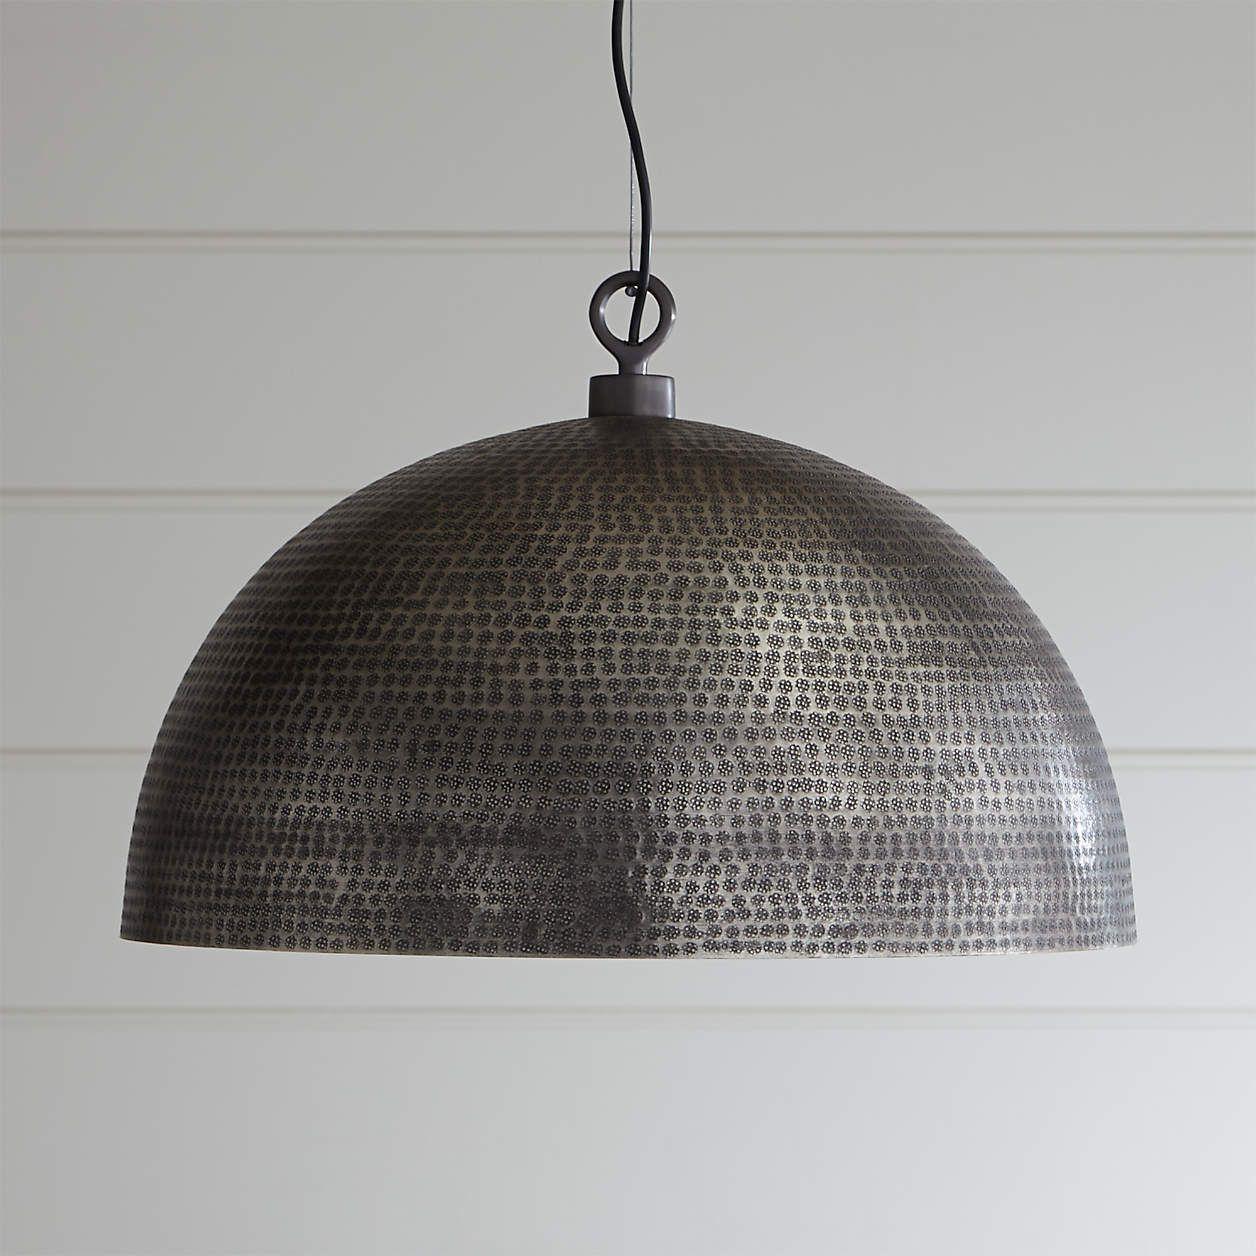 Rodan Hammered Metal Pendant Light Reviews Crate And Barrel In 2021 Metal Pendant Light Dome Pendant Lighting Pendant Light